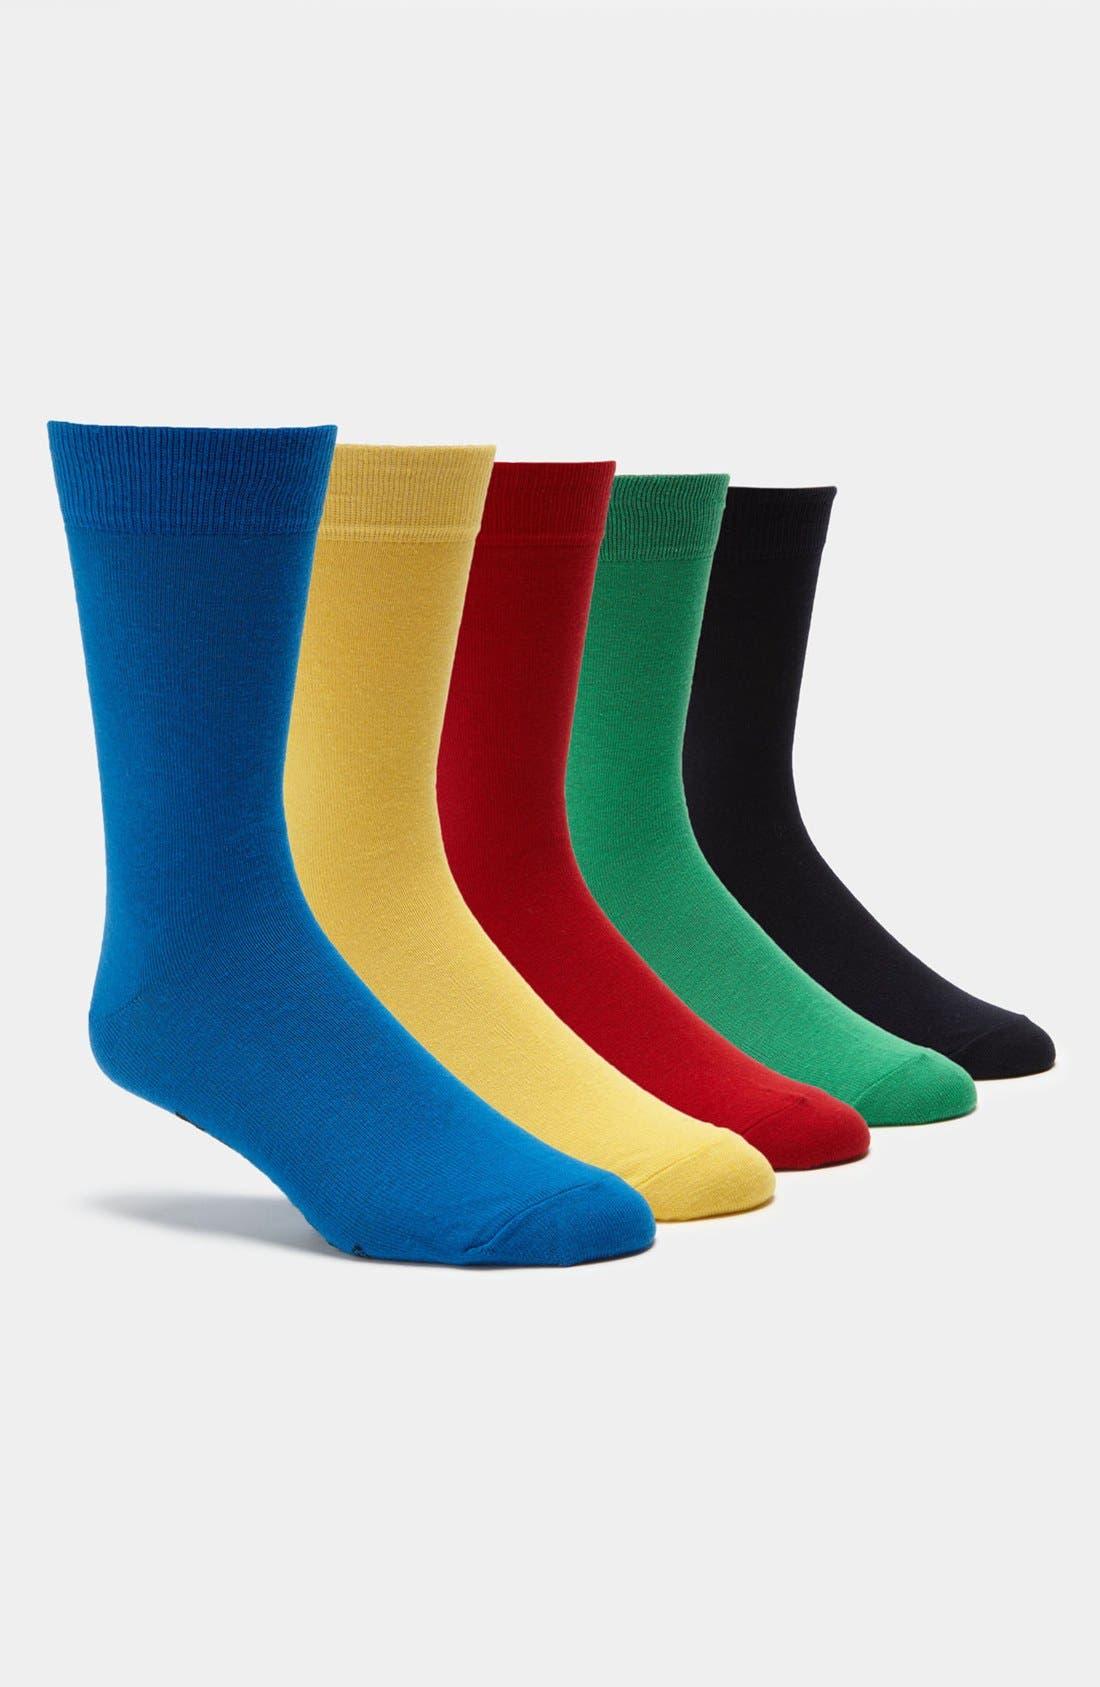 Alternate Image 1 Selected - Topman Bright Socks (5-Pack)